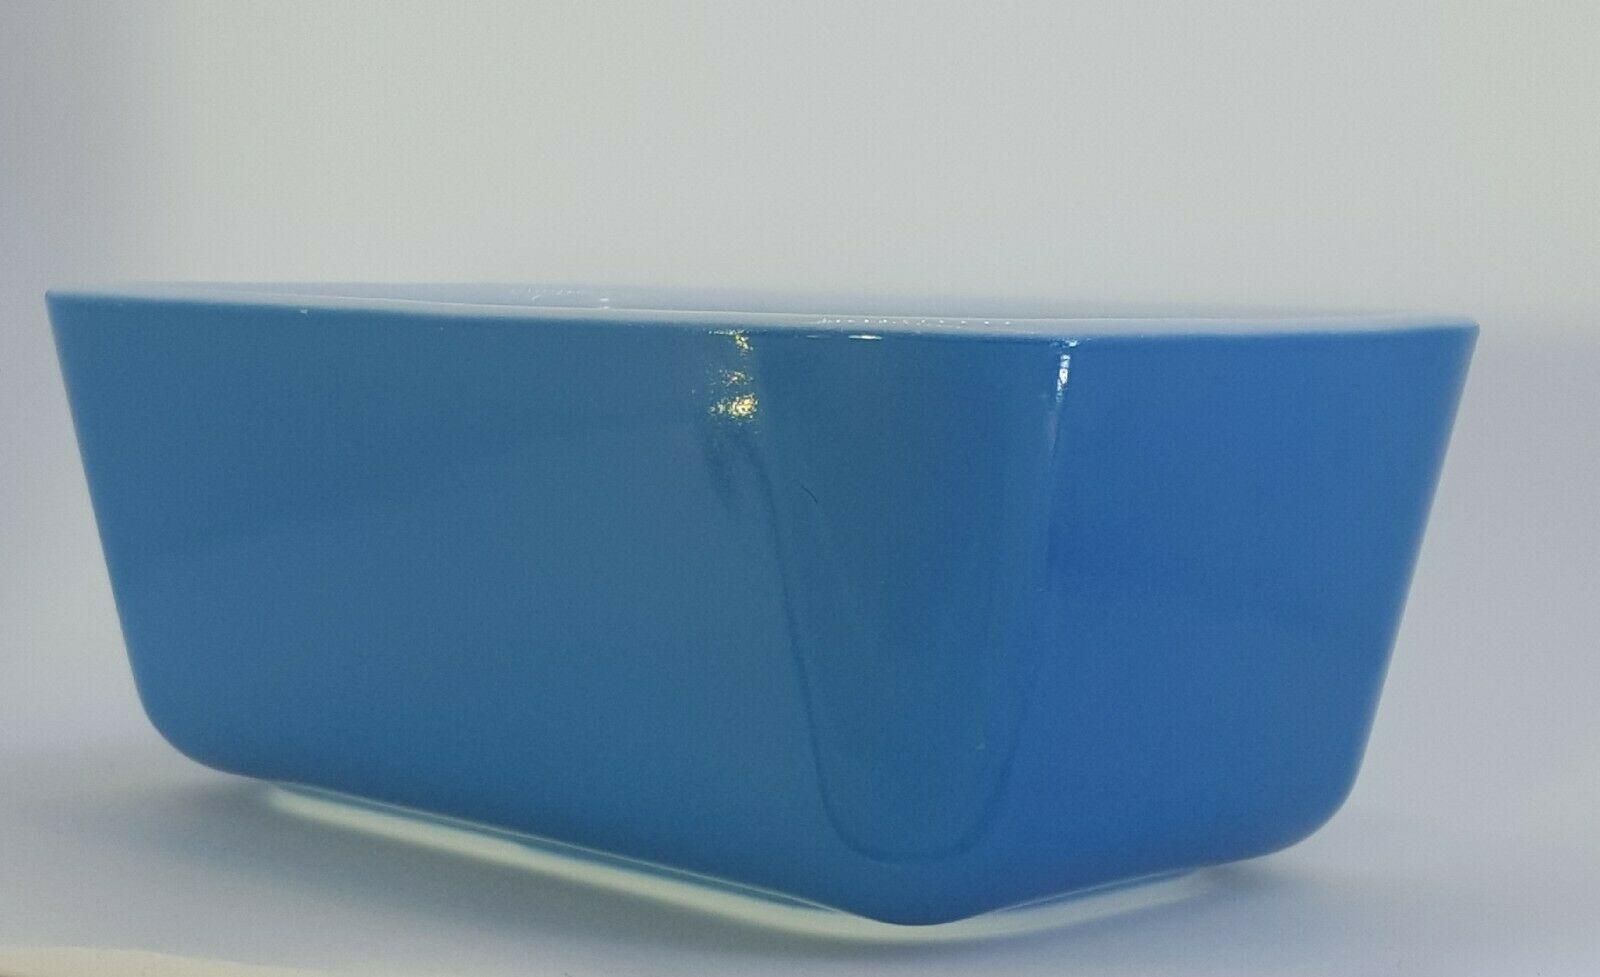 Pyrex #0502 Vintage Primary Blue Loaf Pan Baking Refrigerator Dish 1 1/2 PT EUC!  - Ideas of Pyrex #Pyrex